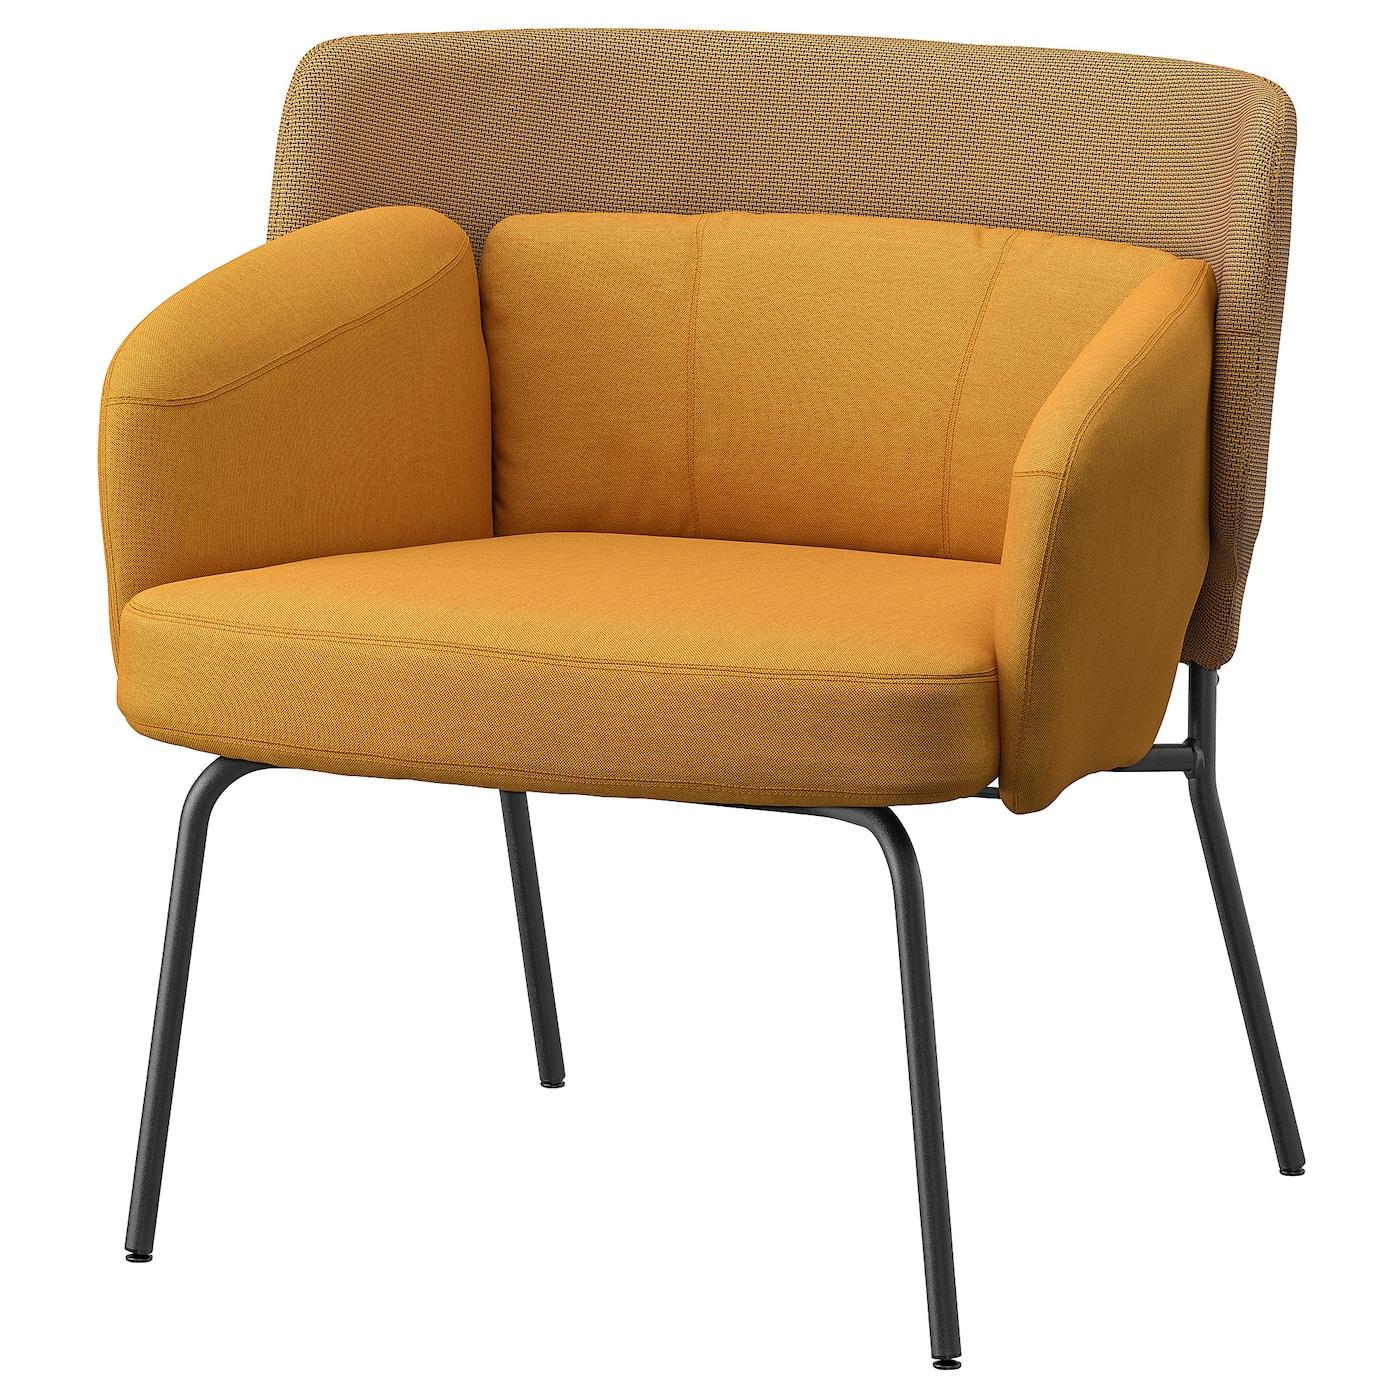 IKEA BINGSTA Fotel, Vissle ciemnożółty, Kabusa ciemnożółty